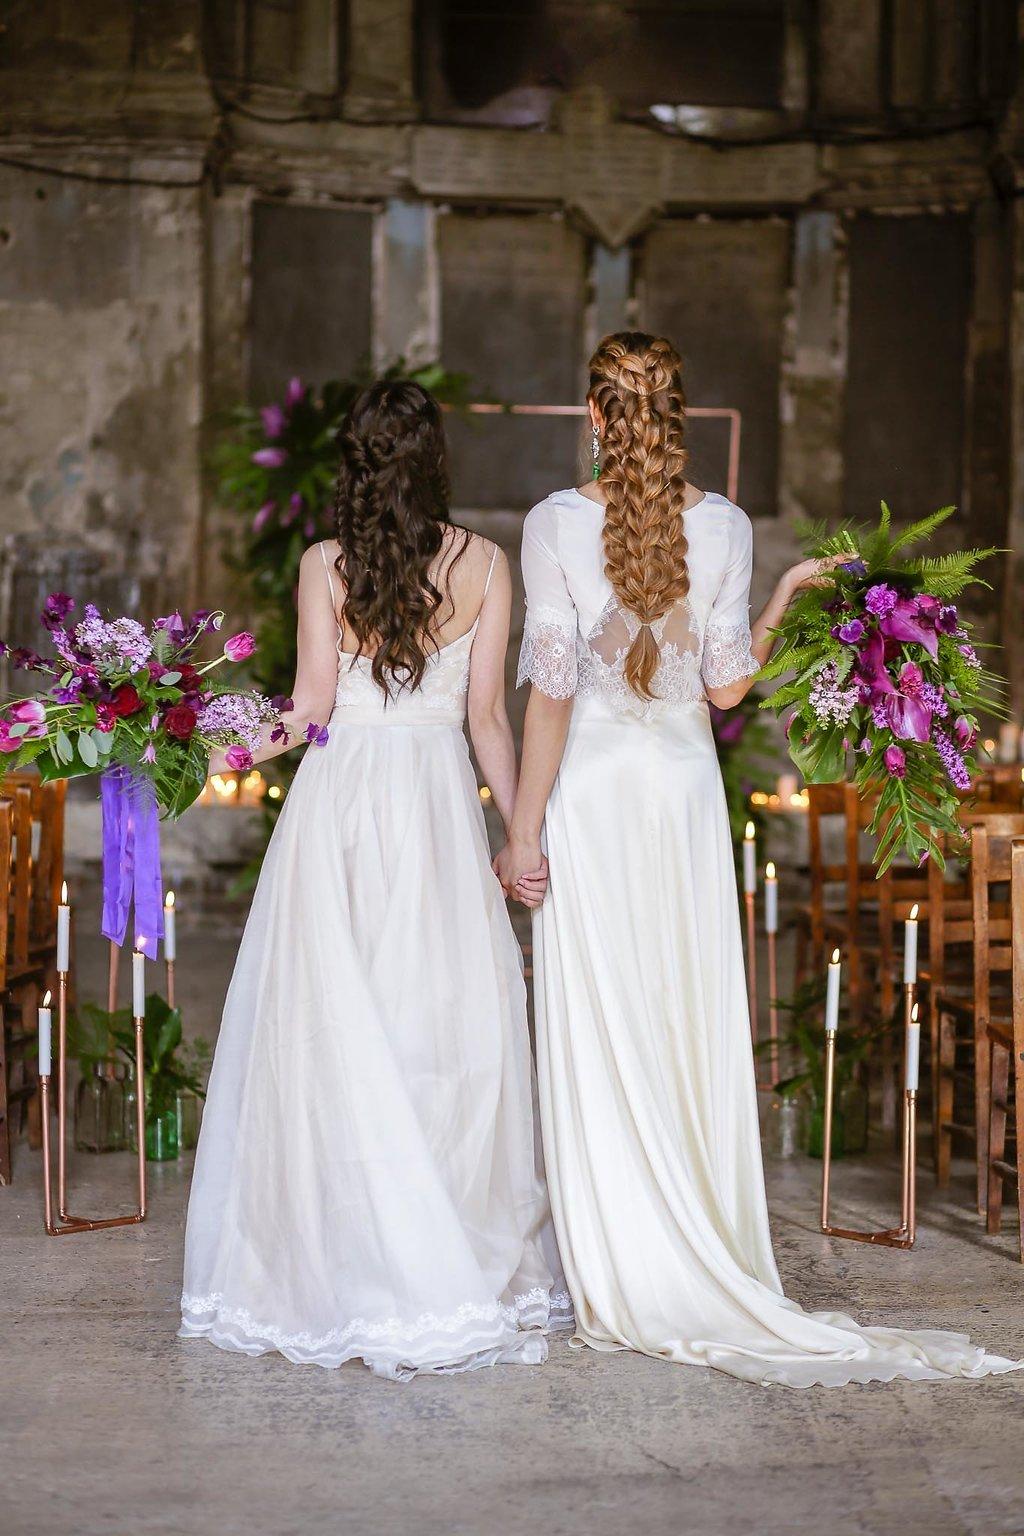 Rock the Purple Love - Gido Weddings - The Asylum Chapel - alternative wedding inspiration 116 - Rock the Purple Love - Gido Weddings - The Asylum Chapel - alternative wedding inspiration 117 - Urban, modern wedding